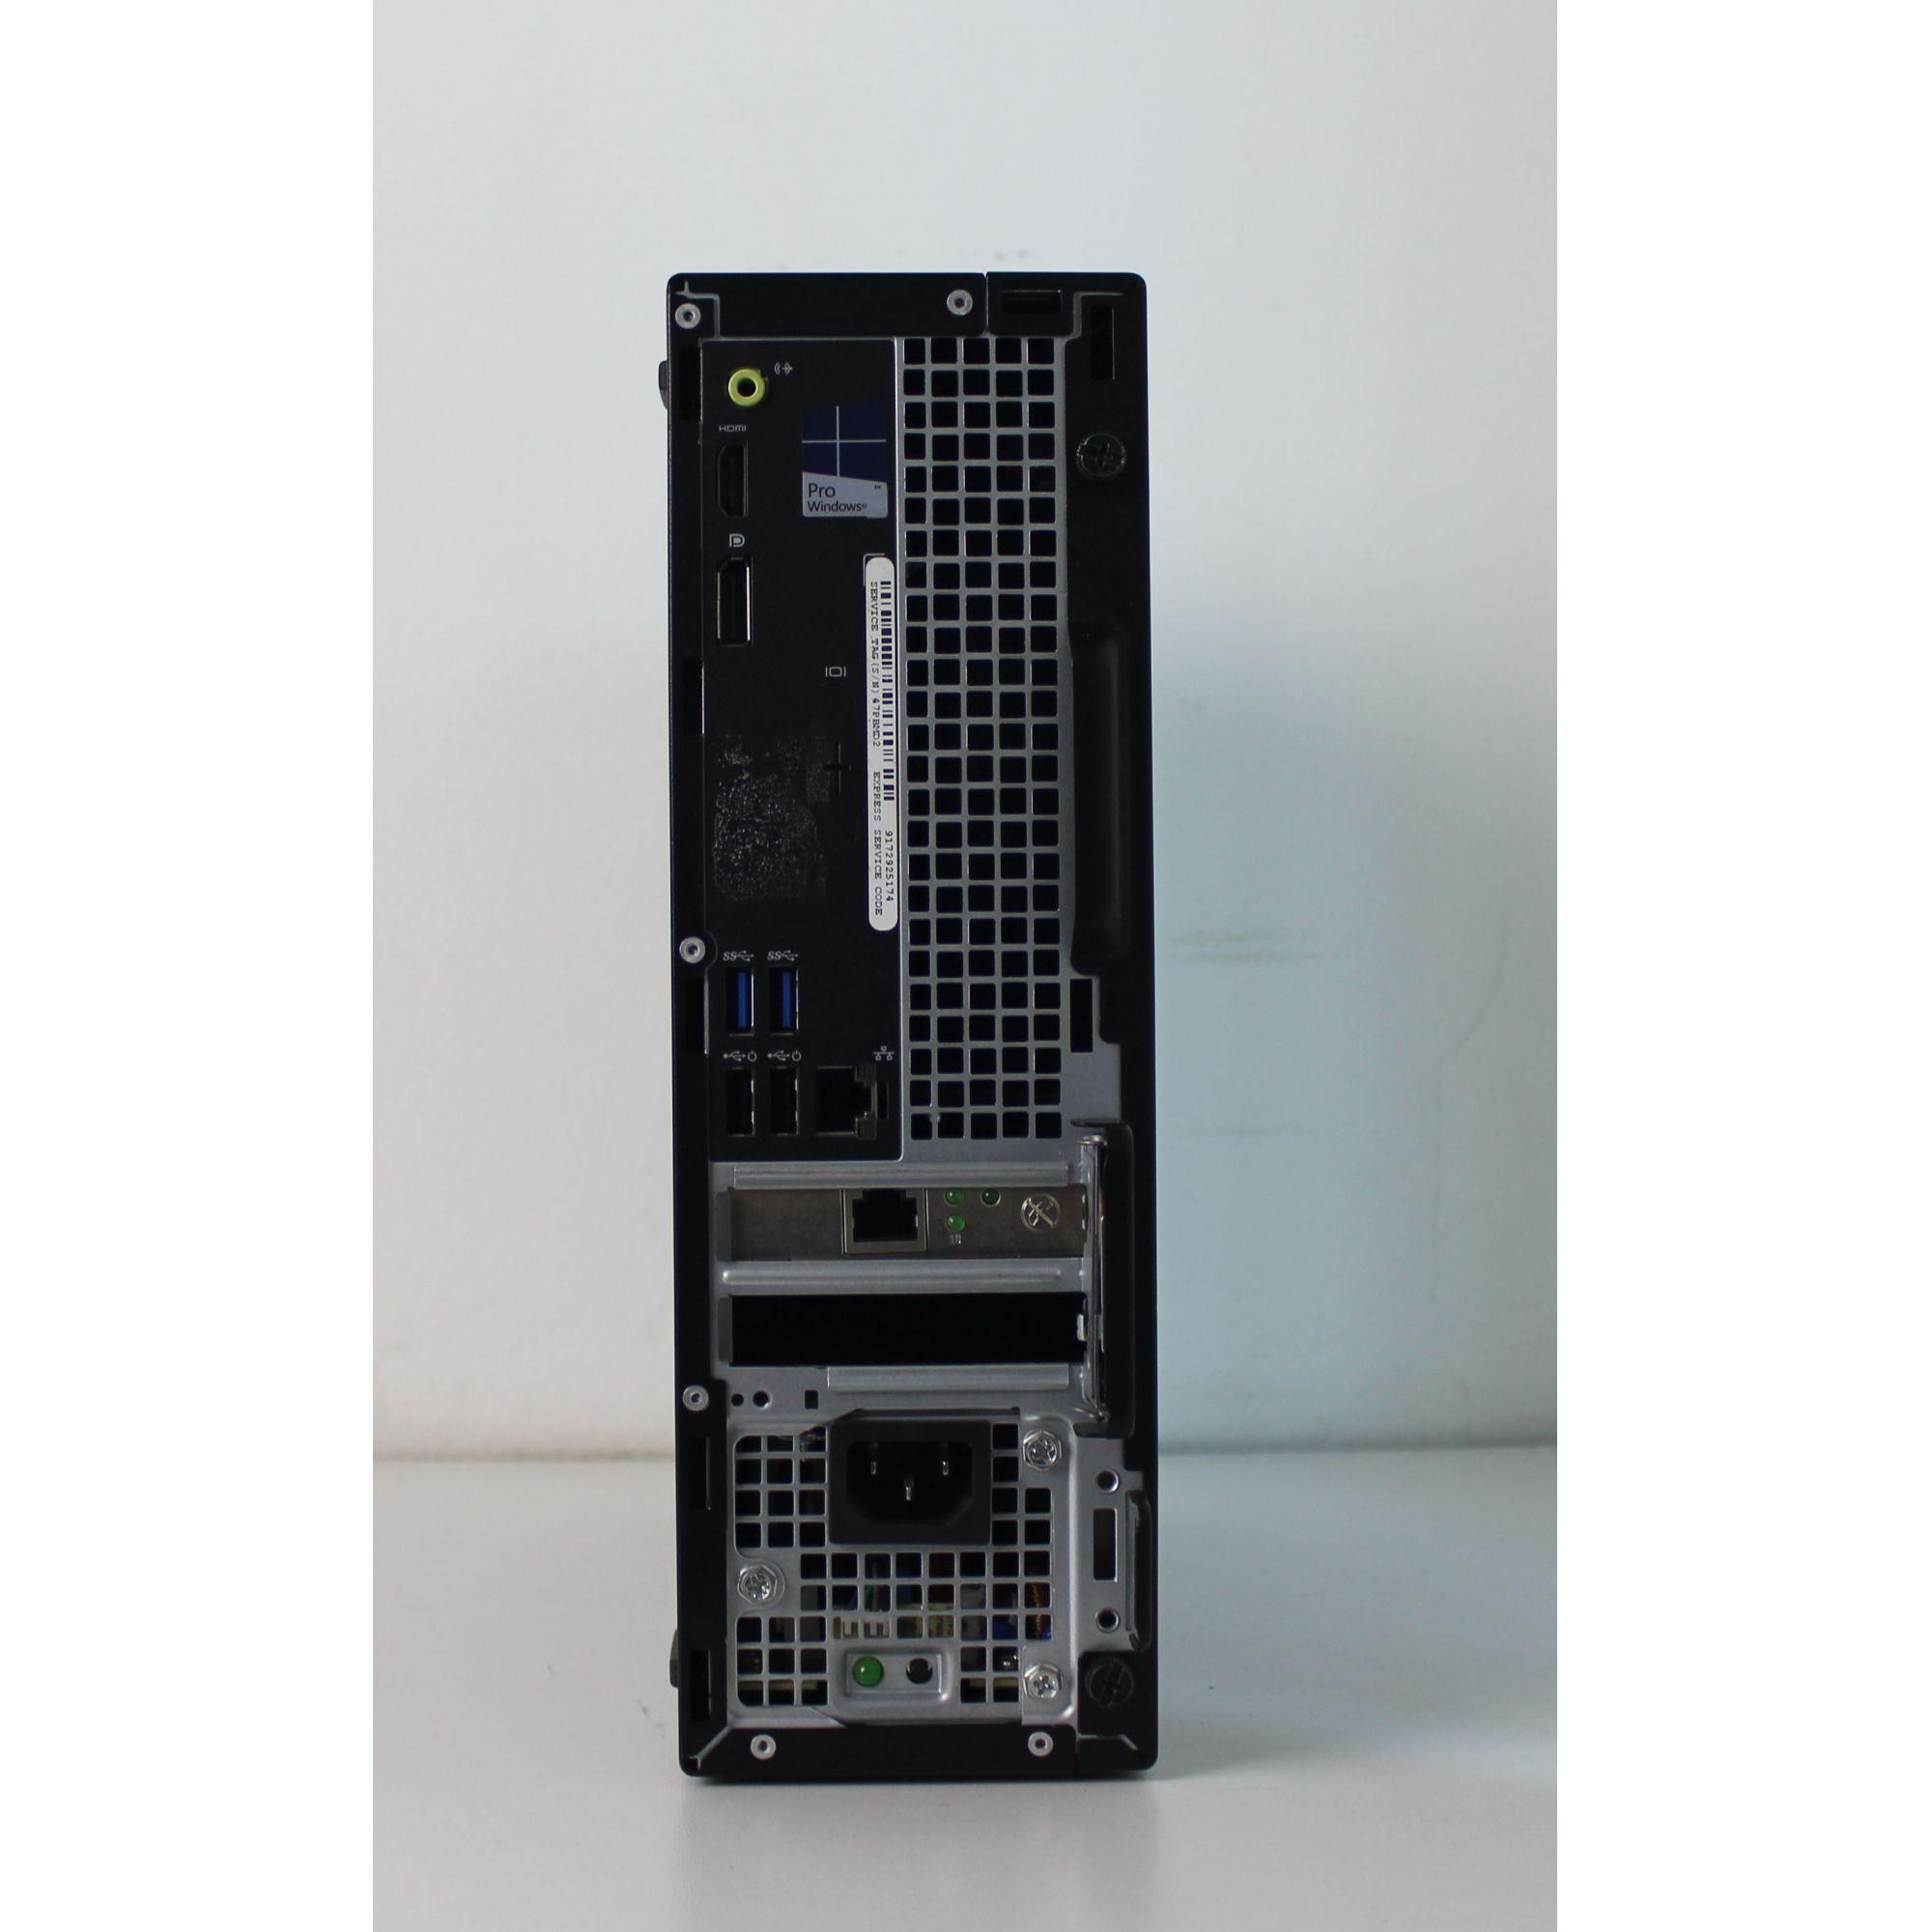 CPU Empresarial Dell Deskslim Optiplex 3040 Intel Core i5 3.2GHz 8GB HD-500GB